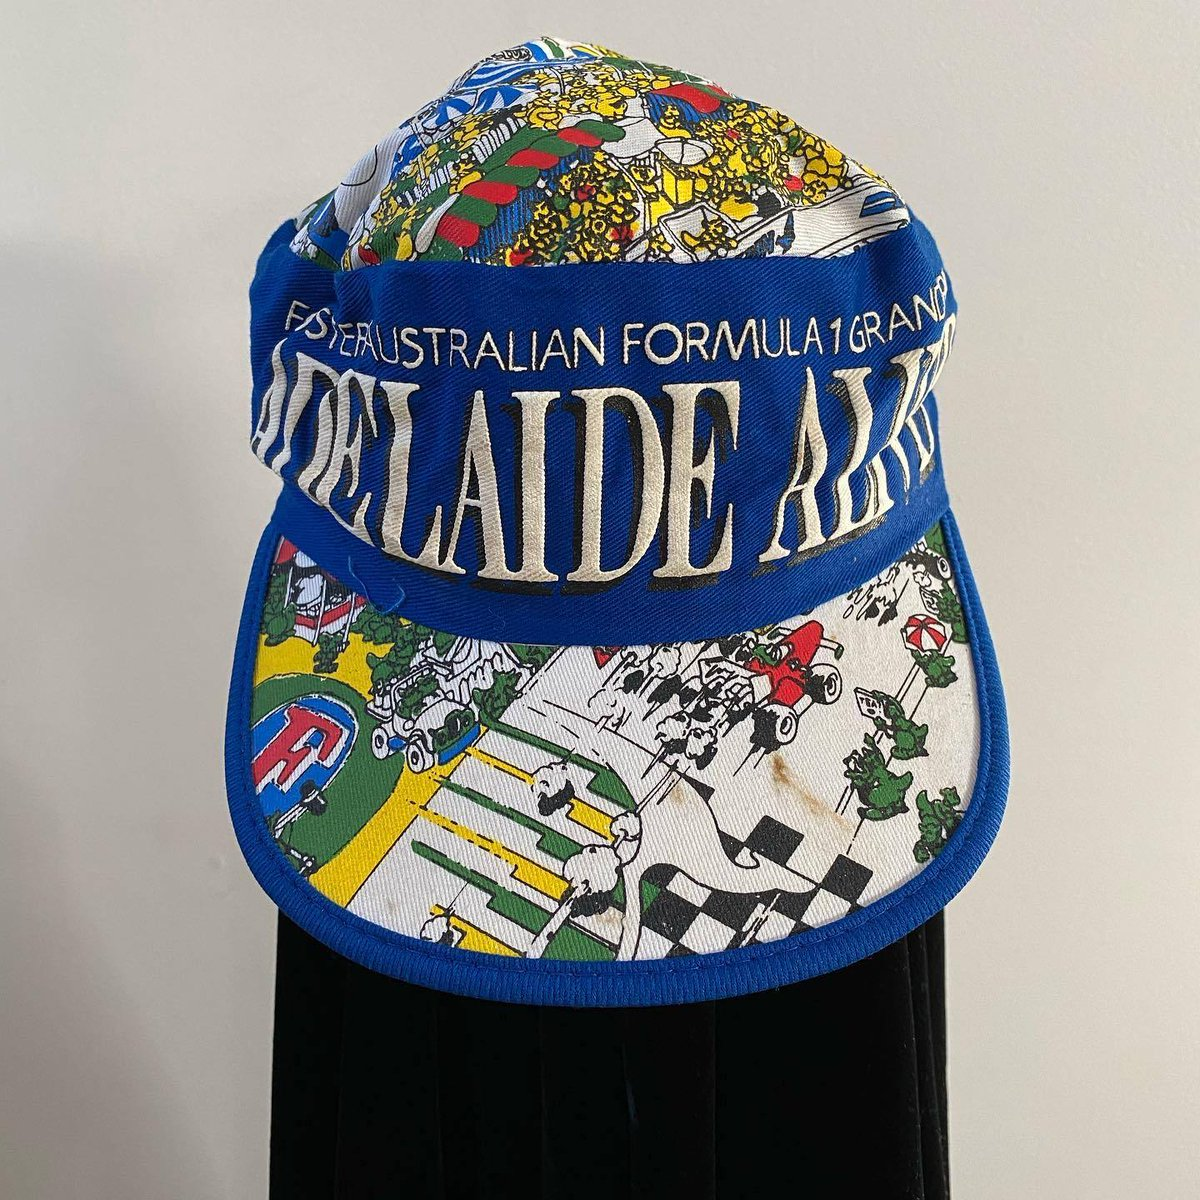 A 1987 Adelaide Grand Prix legionnaire hat. #F1 #Adelaide https://t.co/iOjgLuvs8h